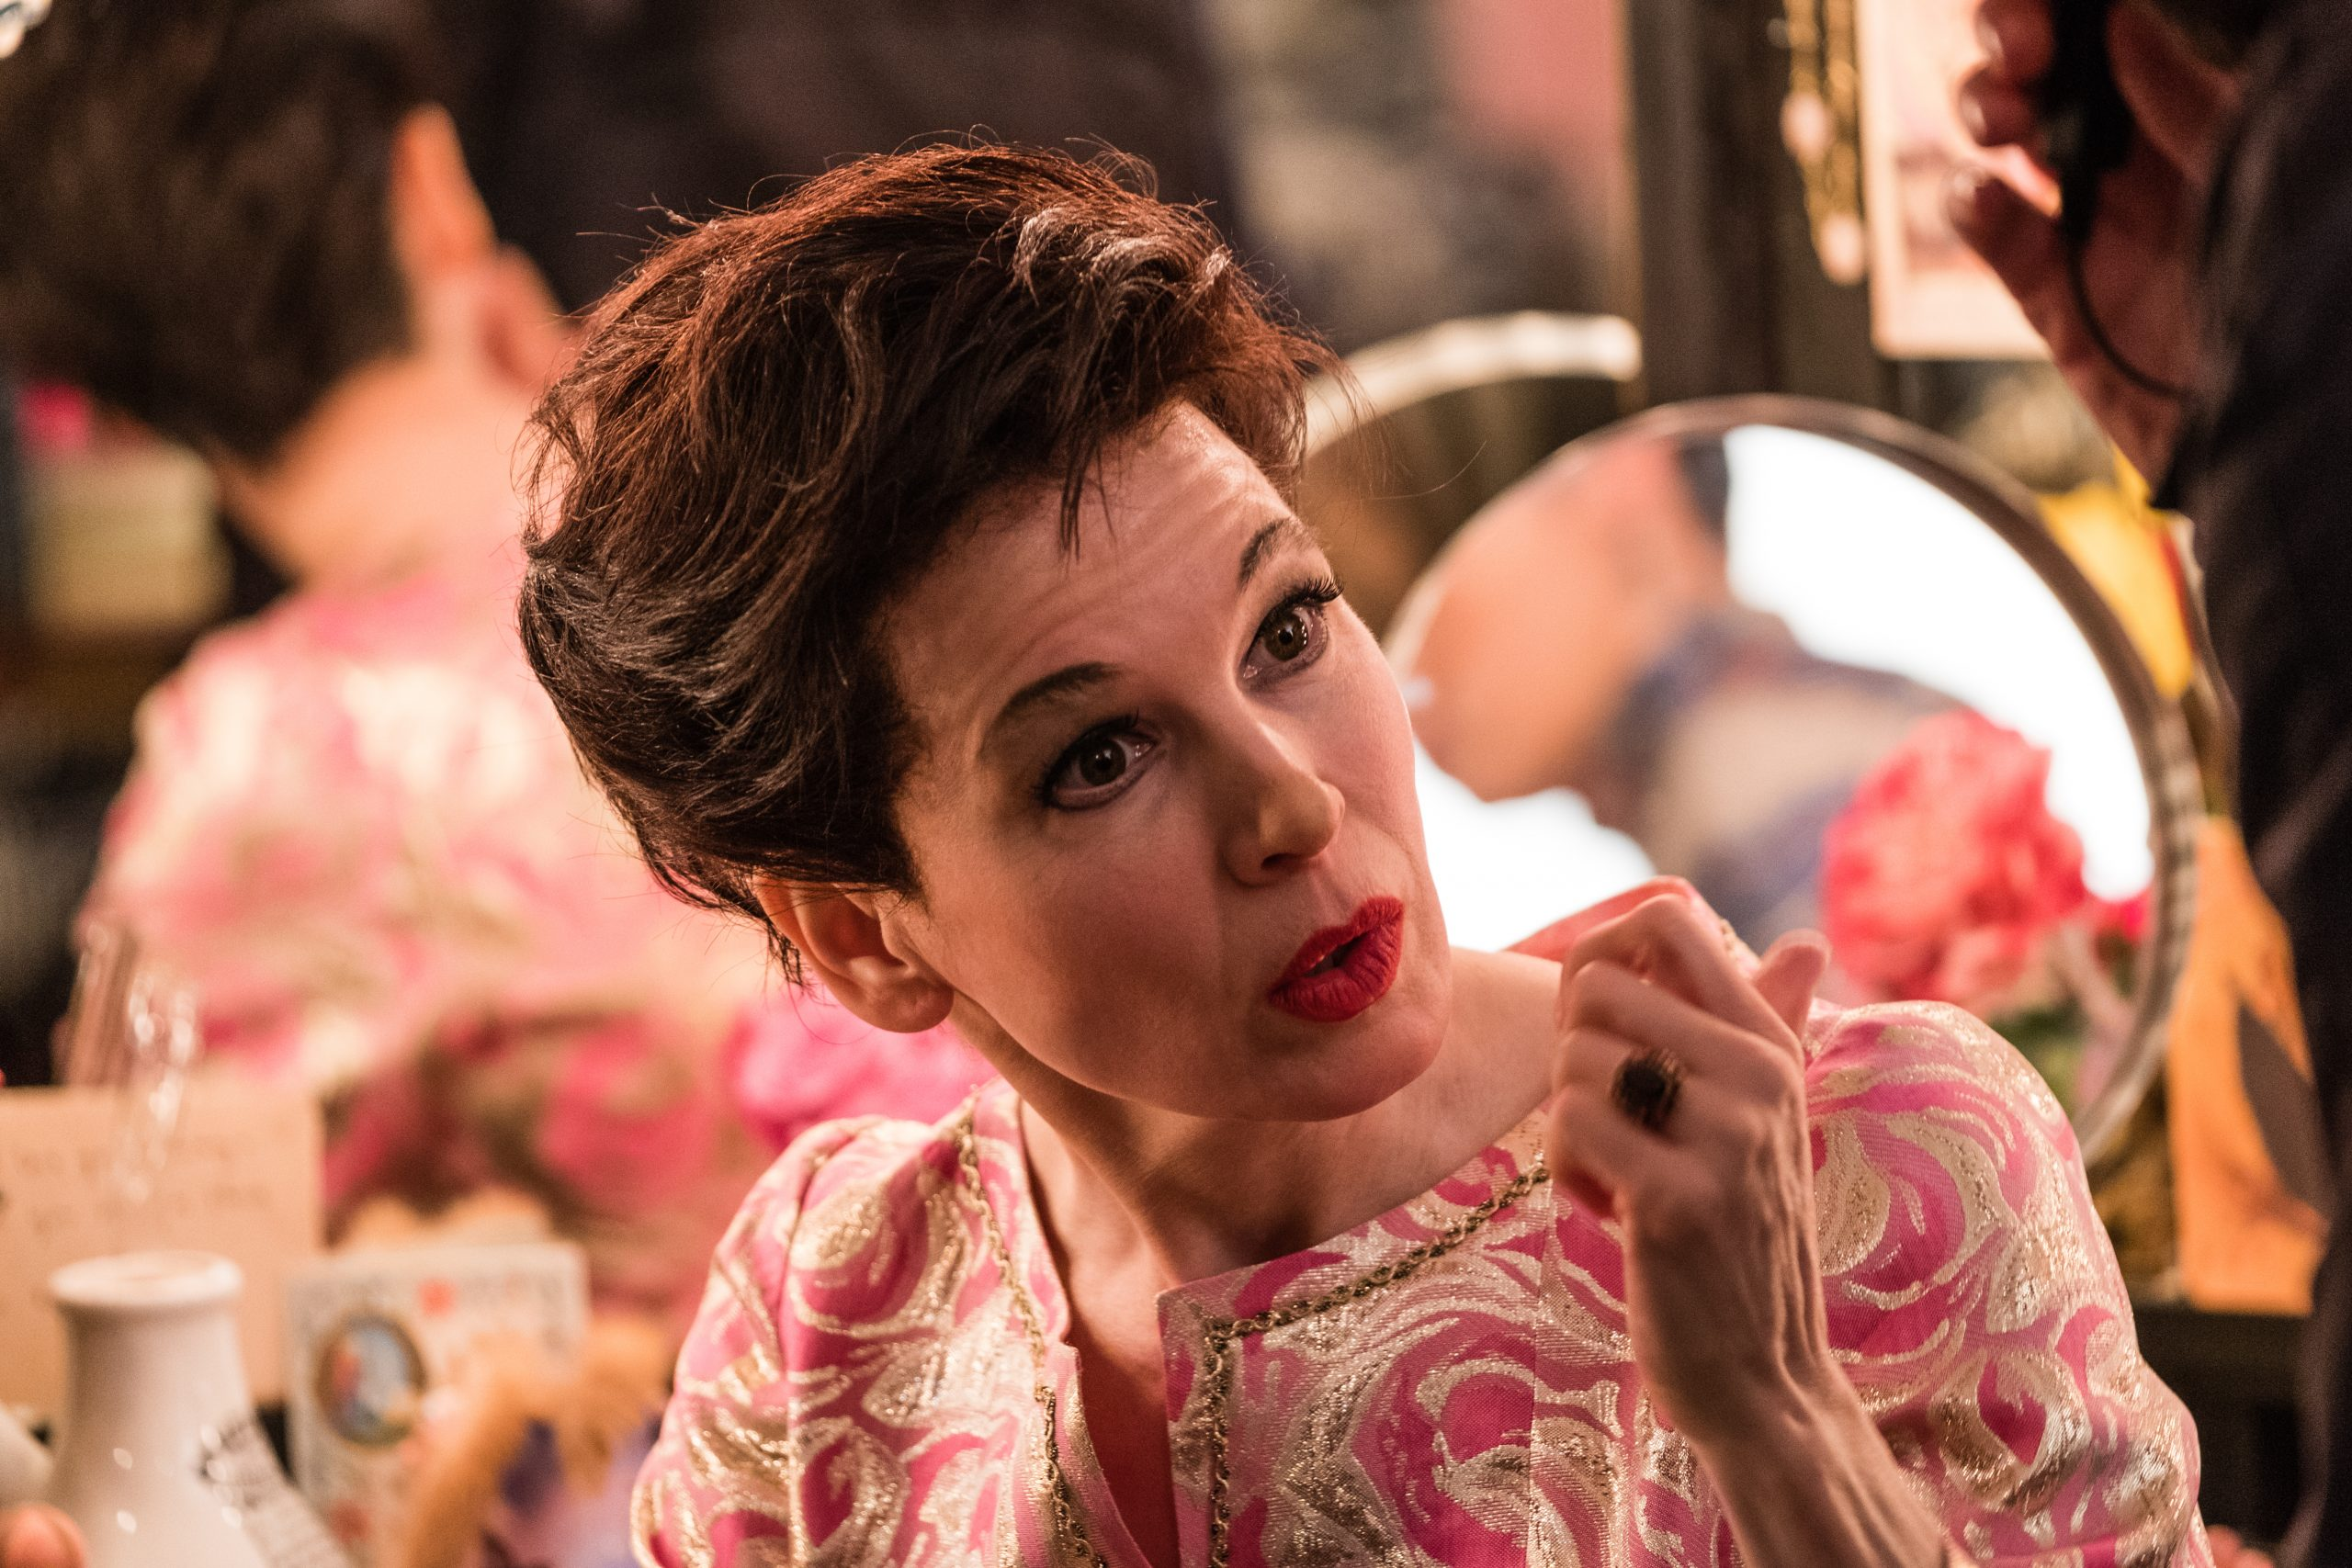 Judy Garland Movie 2019, Judy Garland Movie, Renee Zelwegger Judy Garland, Judy Garland Movie 2019, Judy Garland Film 2019